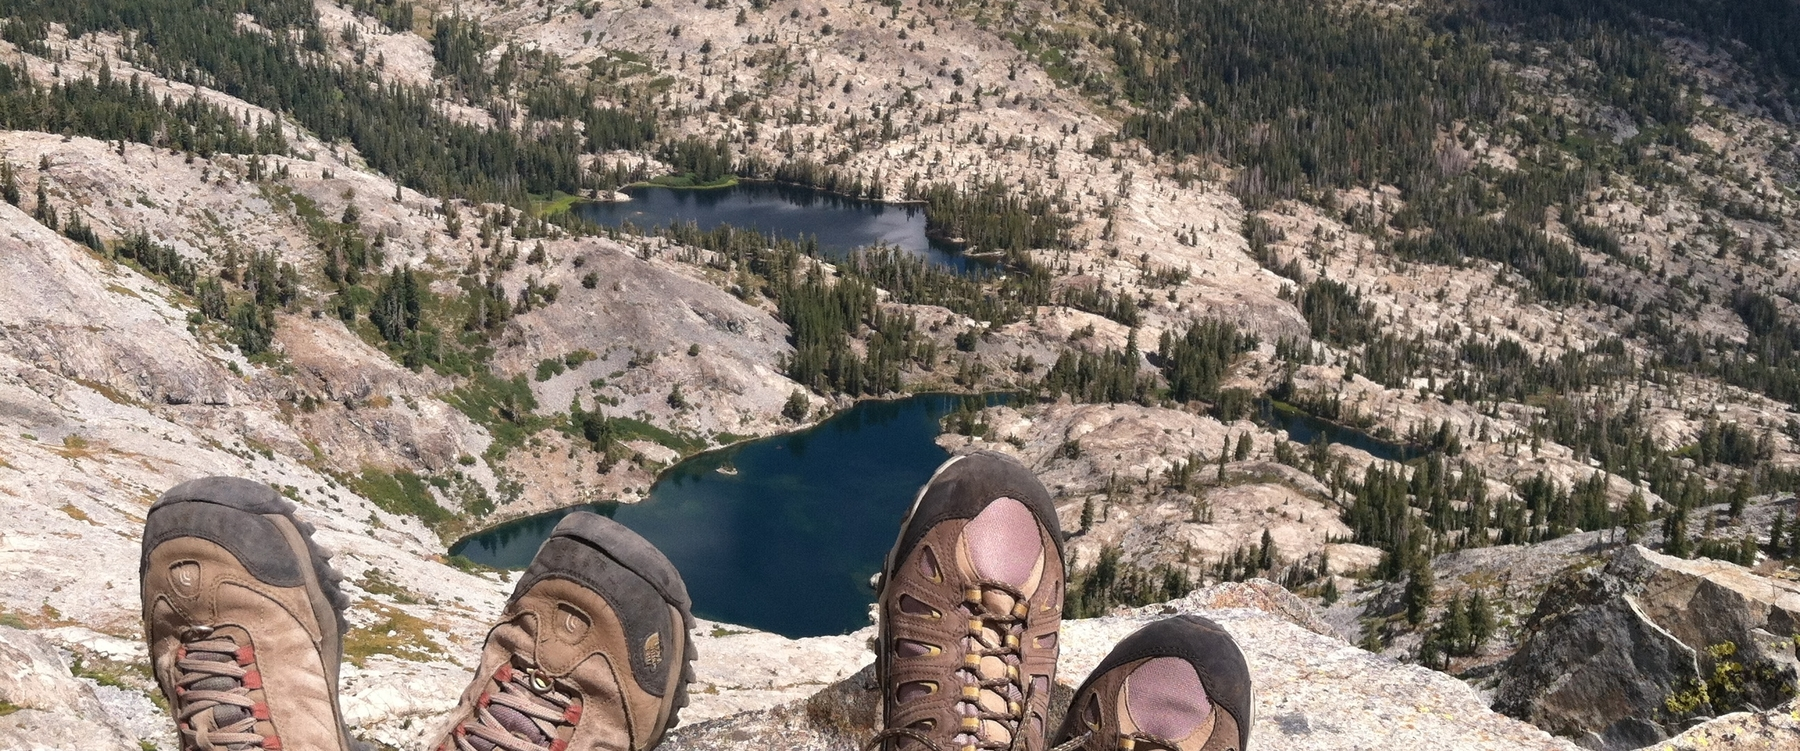 Backpacking / Camping, Trail Running, Cycling, Mountain Biking, Flat Water Paddling, Skiing & Snowboarding